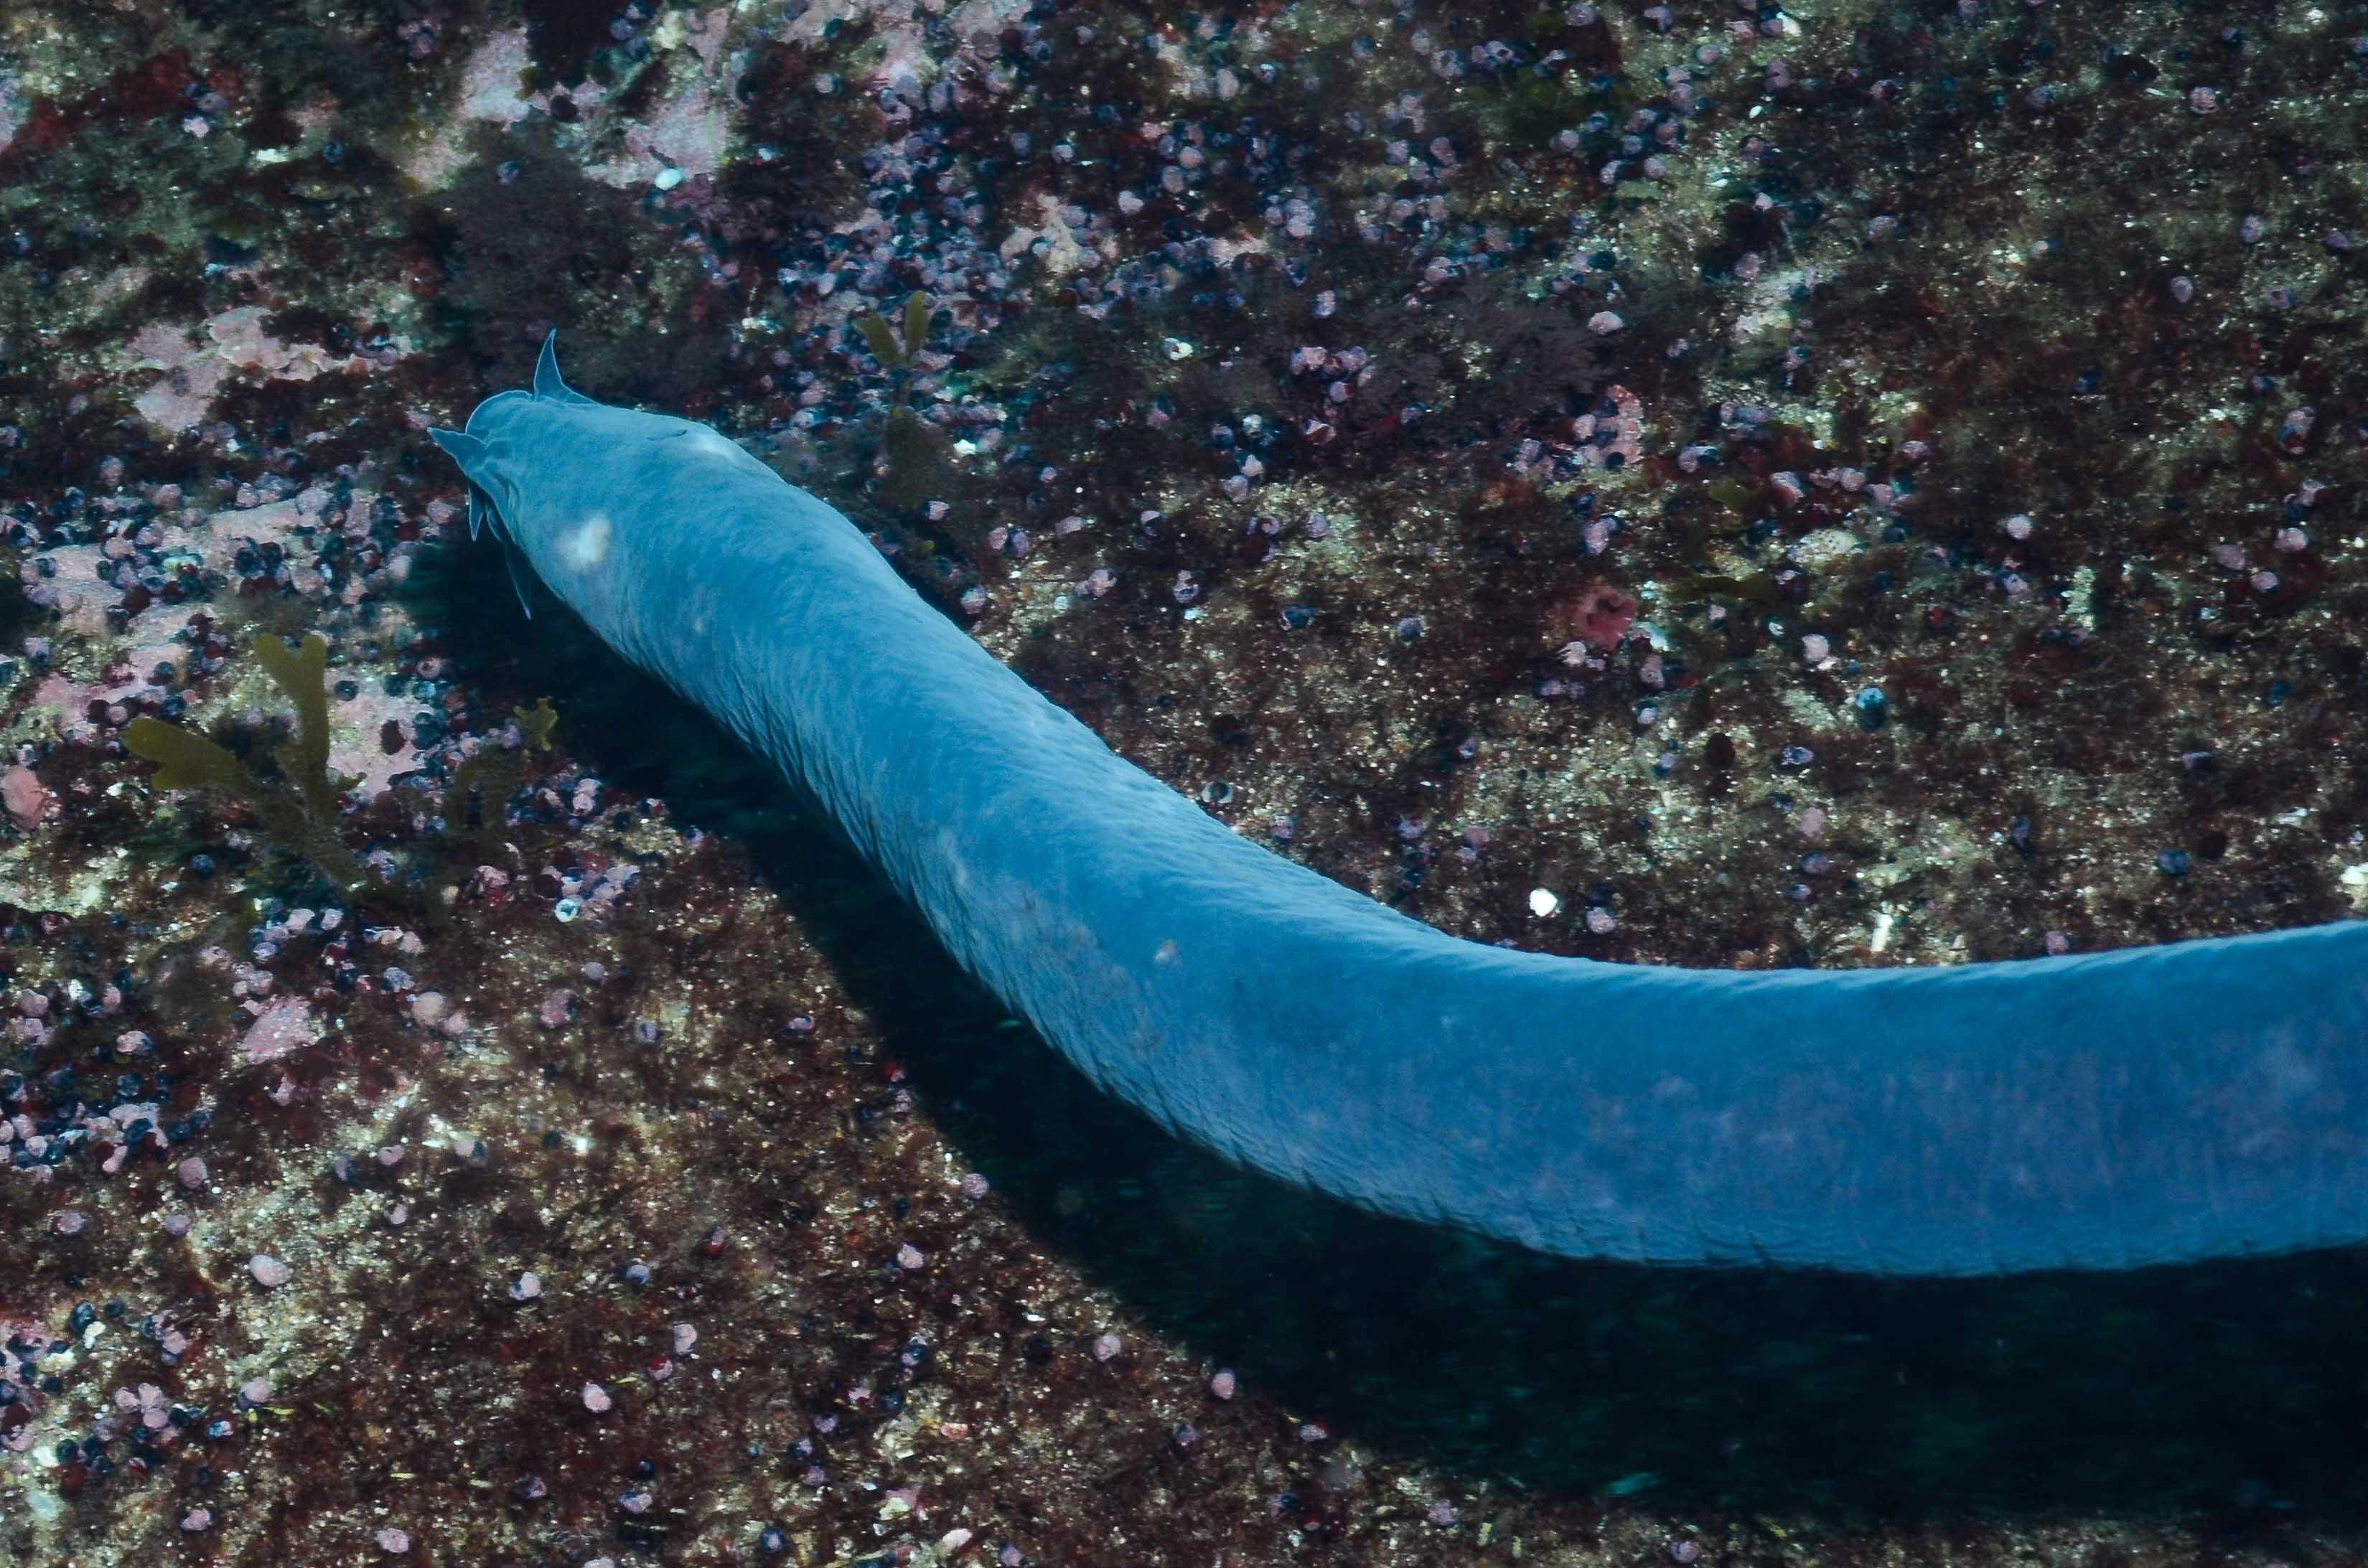 Eptatretus polytrema. Photo by Graham Edgar.